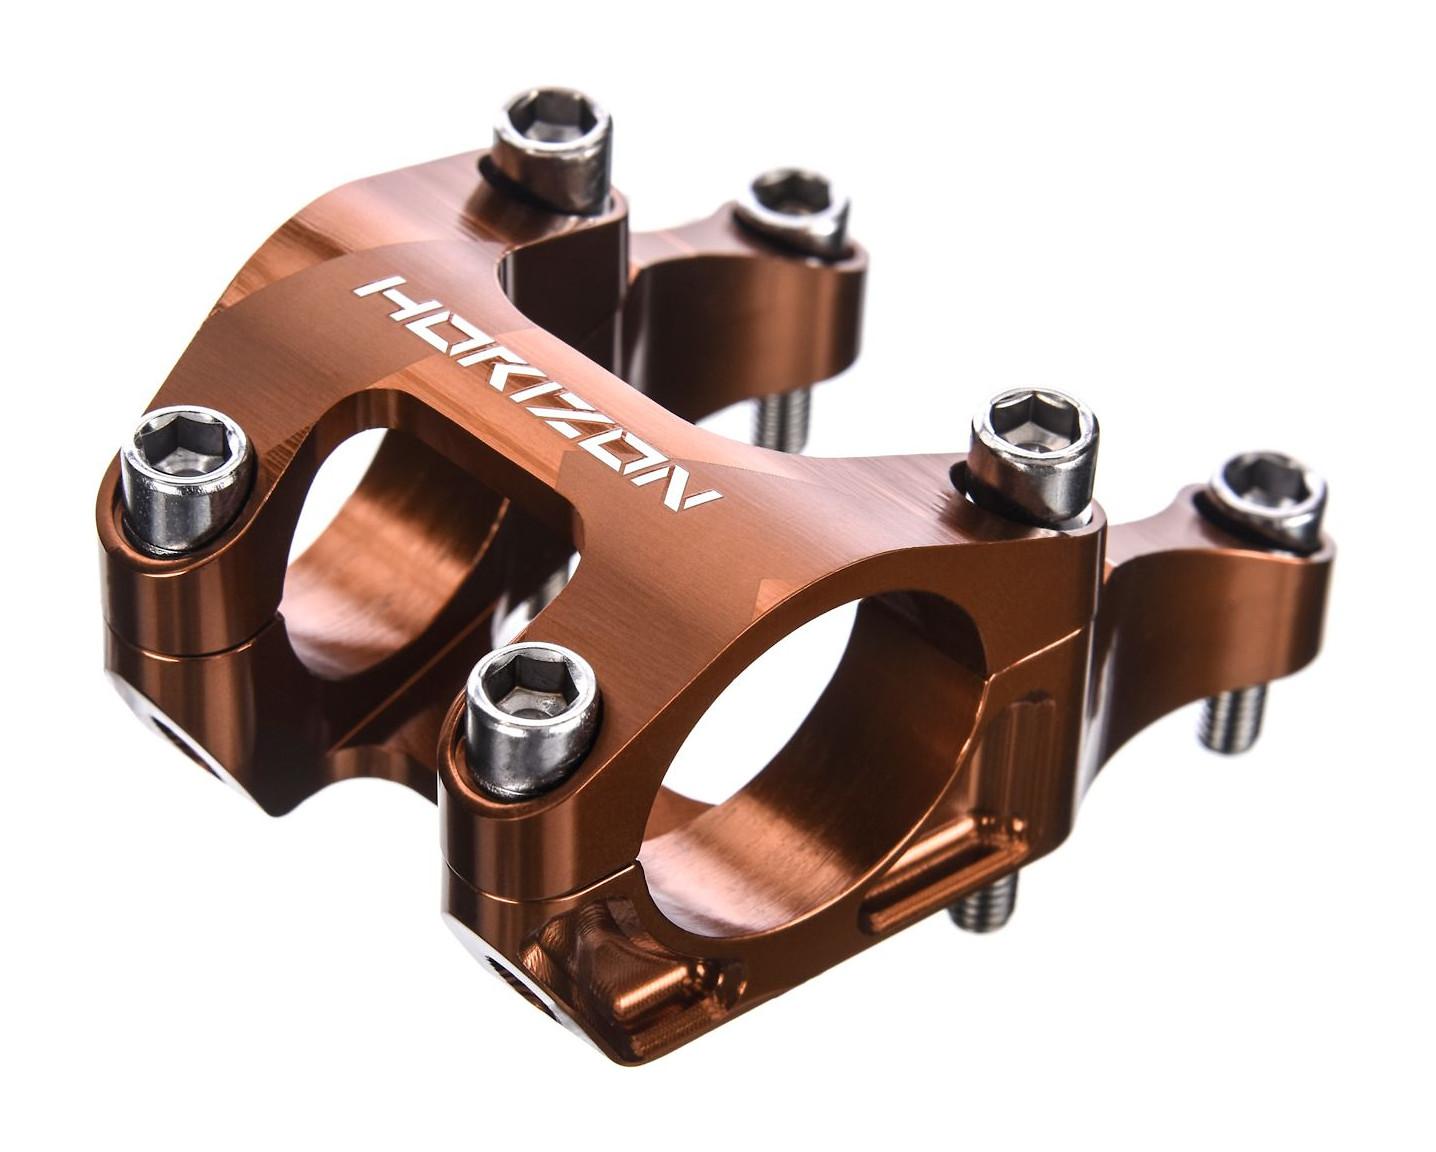 Nukeproof Horizon Direct Mount Stem (copper)